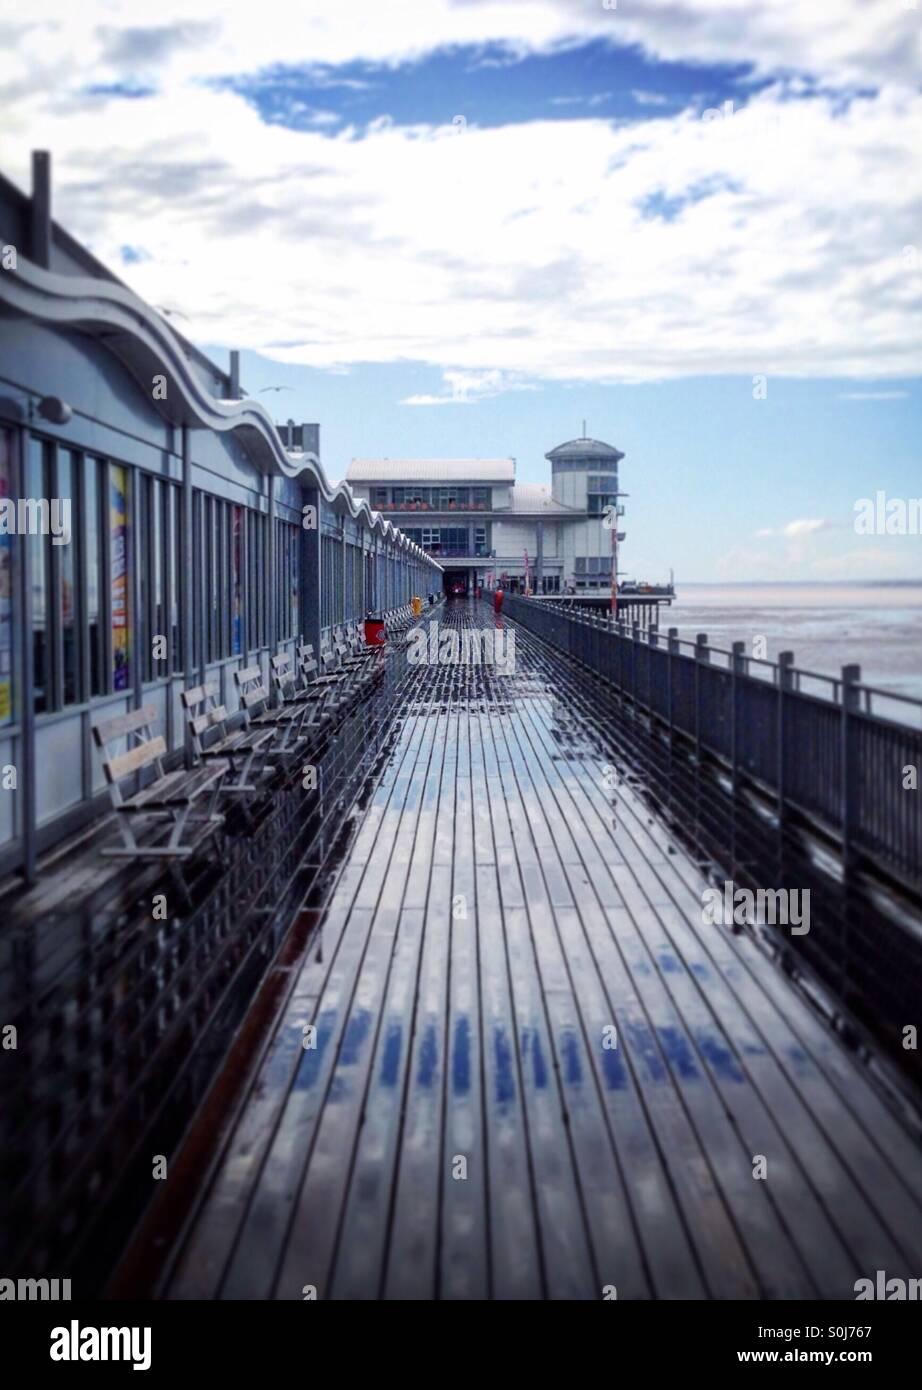 Wet seaside pier view - Stock Image